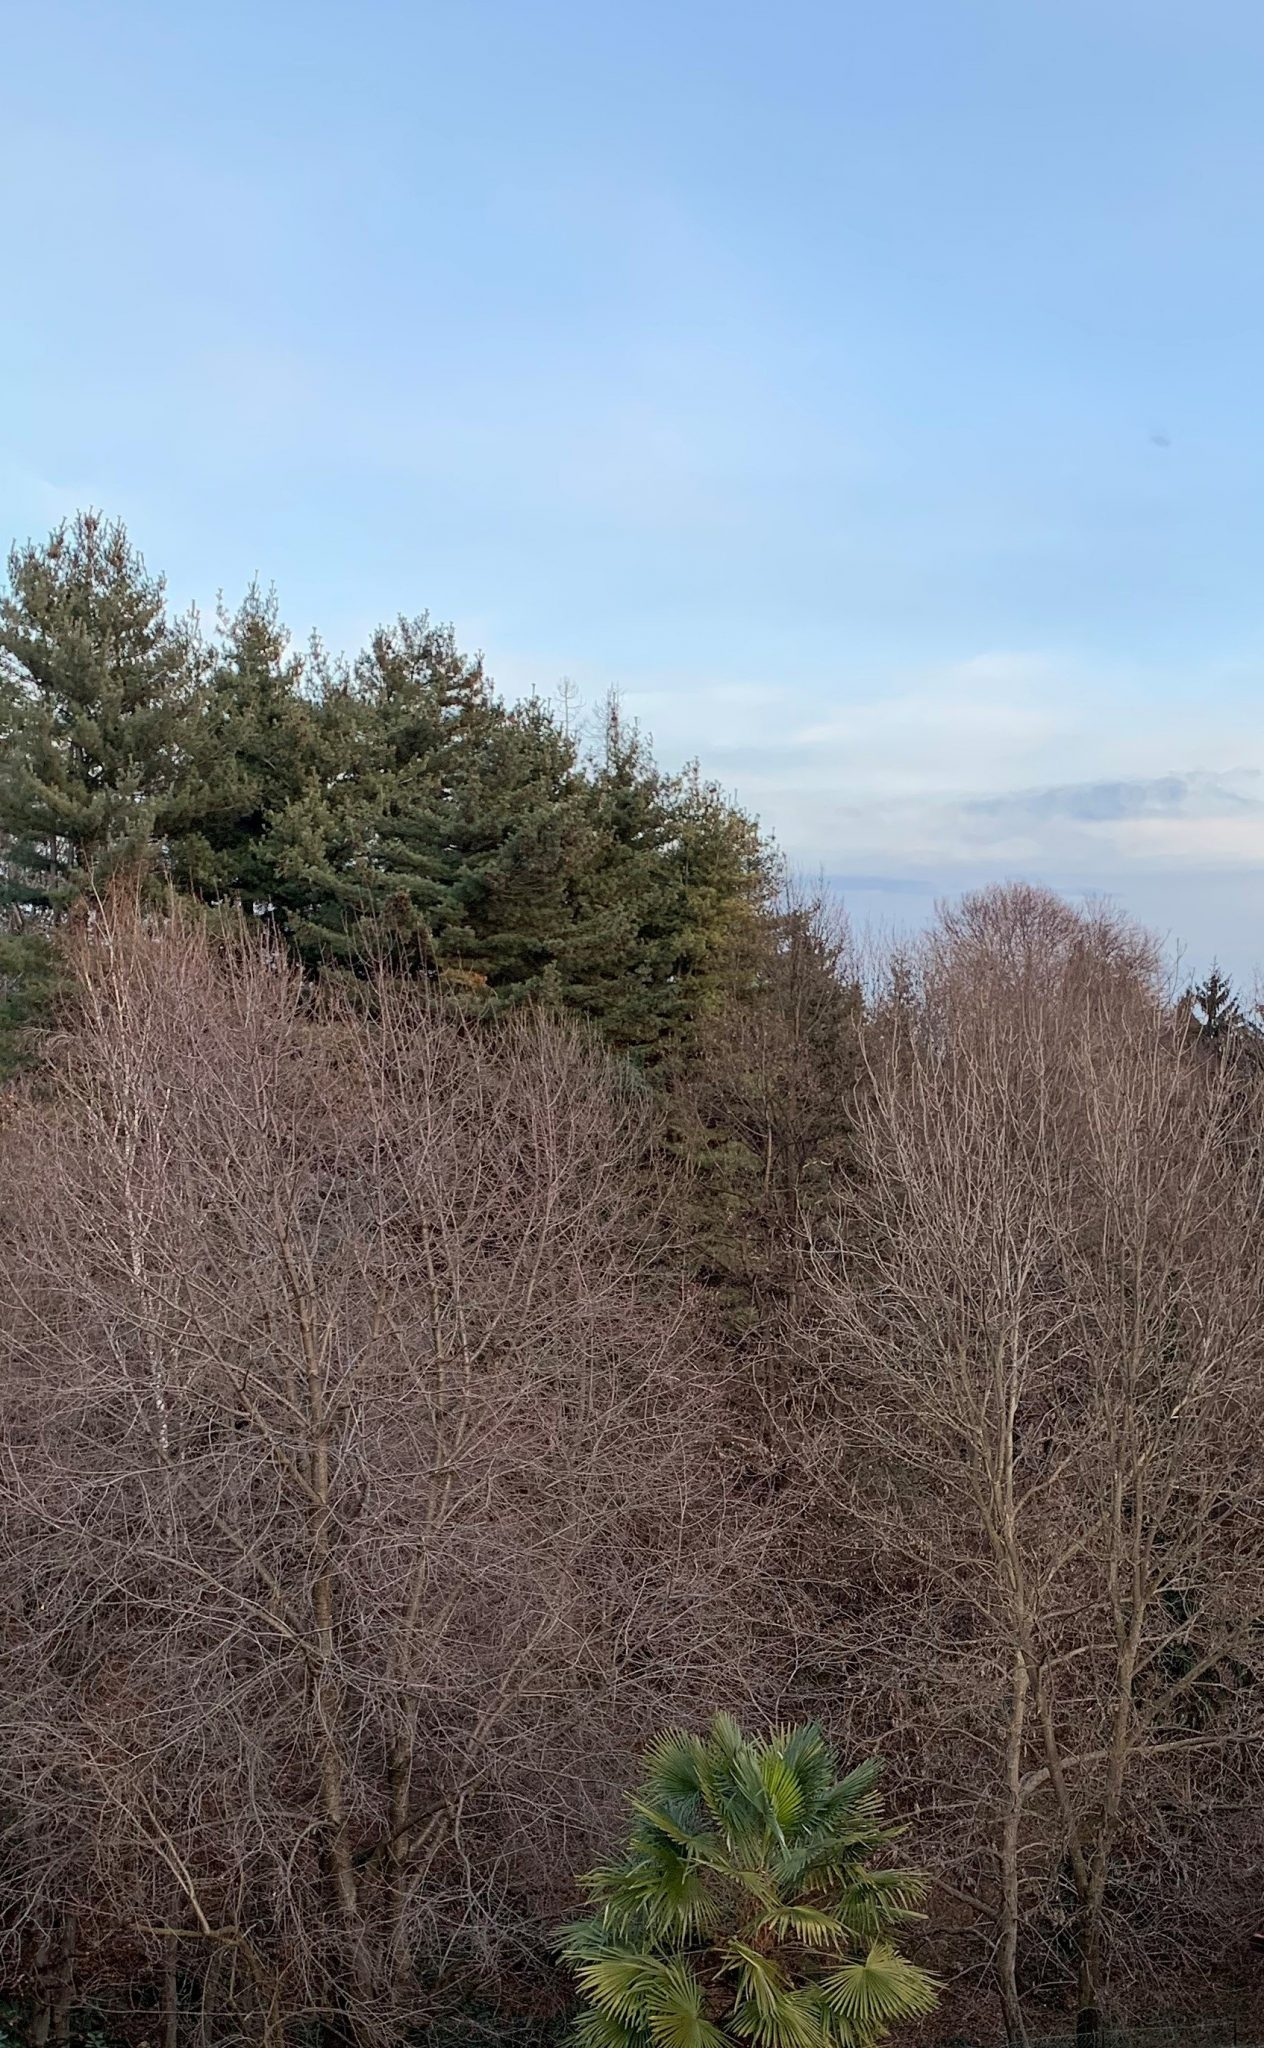 iPhone XR camera trees sky